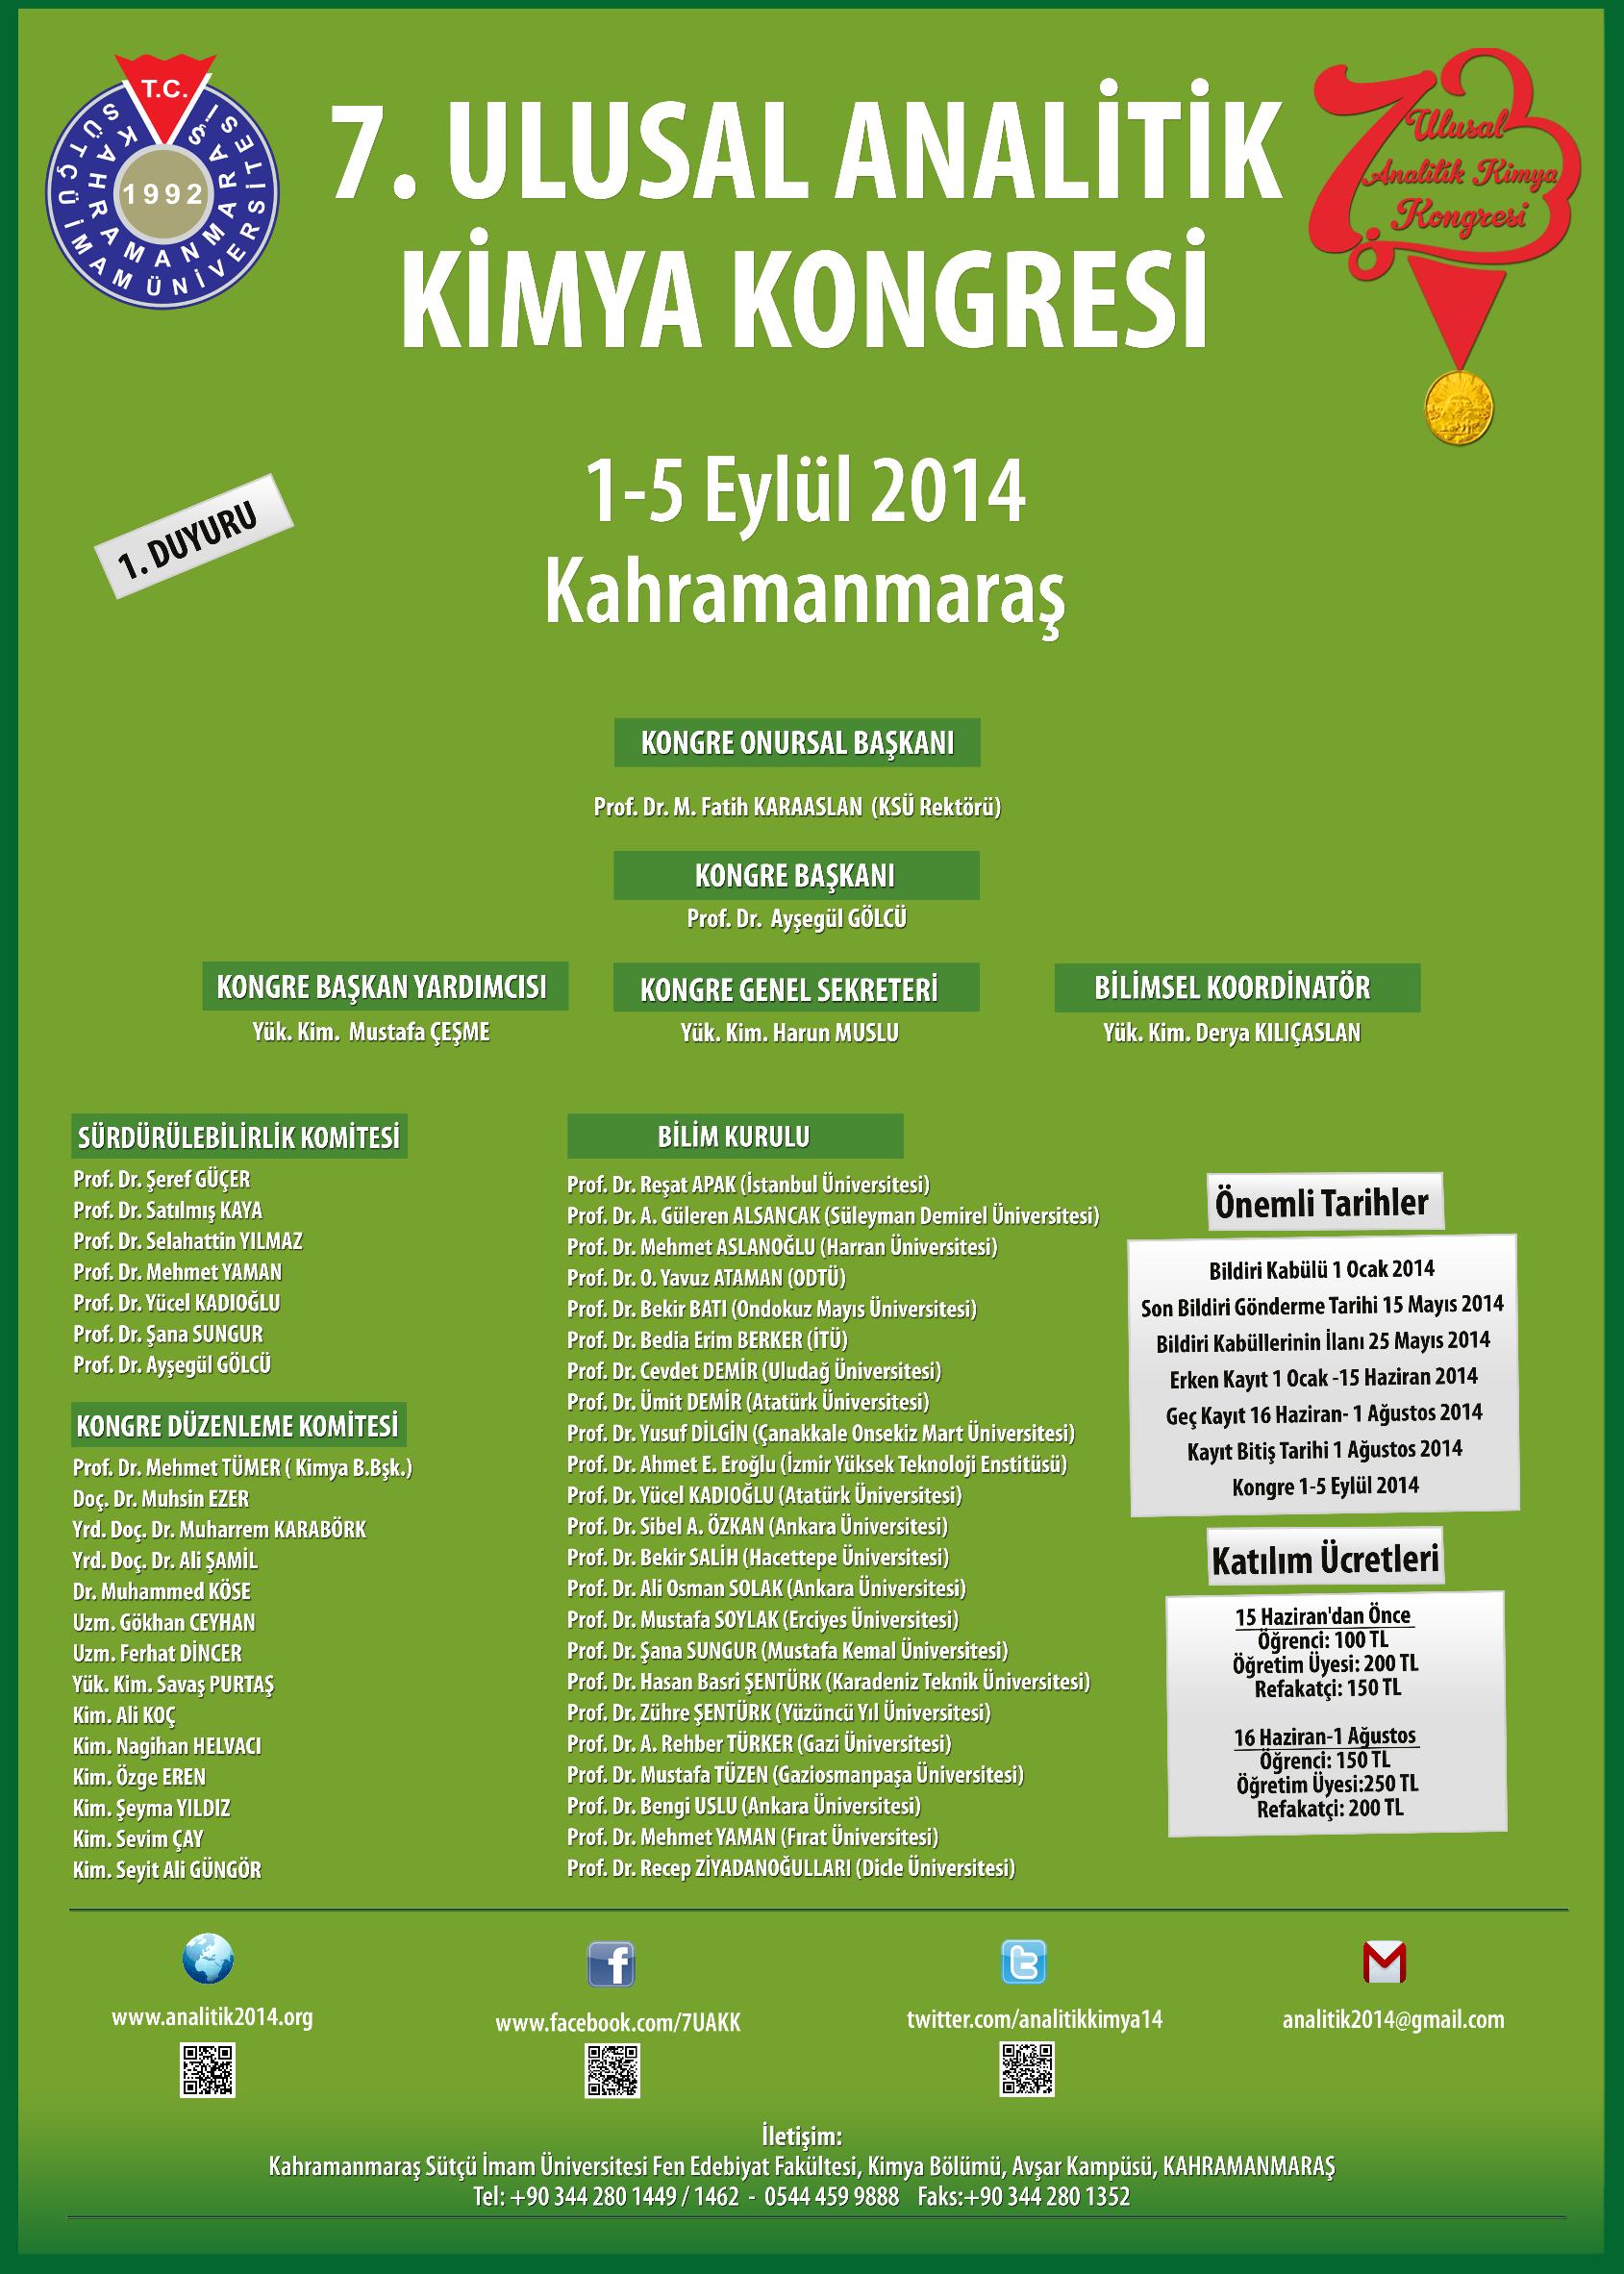 7. Ulusal Analitik Kimya Kongresi: http://www.tumkongreler.com/kongre/7-ulusal-analitik-kimya-kongresi #chemistry #analiticalChemistry #kahramanmaraş